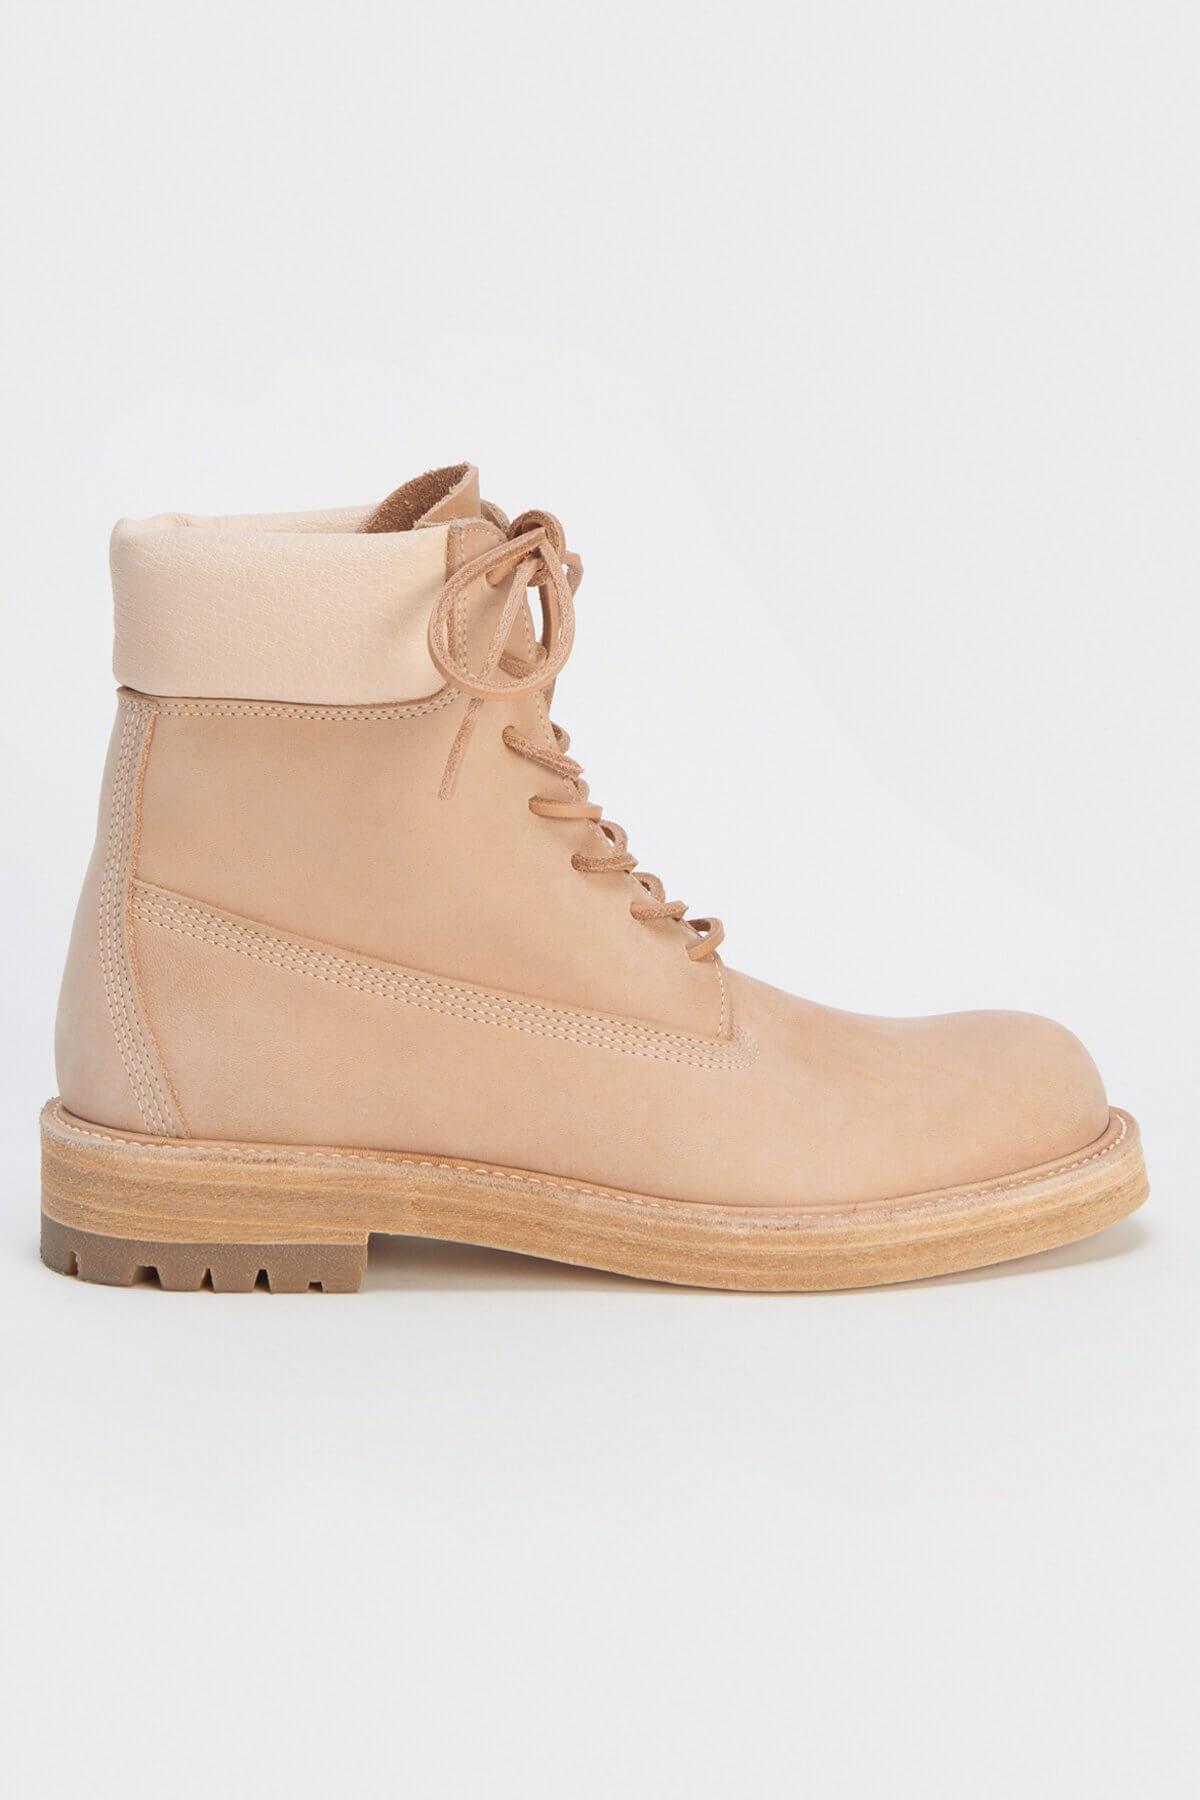 hender scheme mip 14 timberland boots